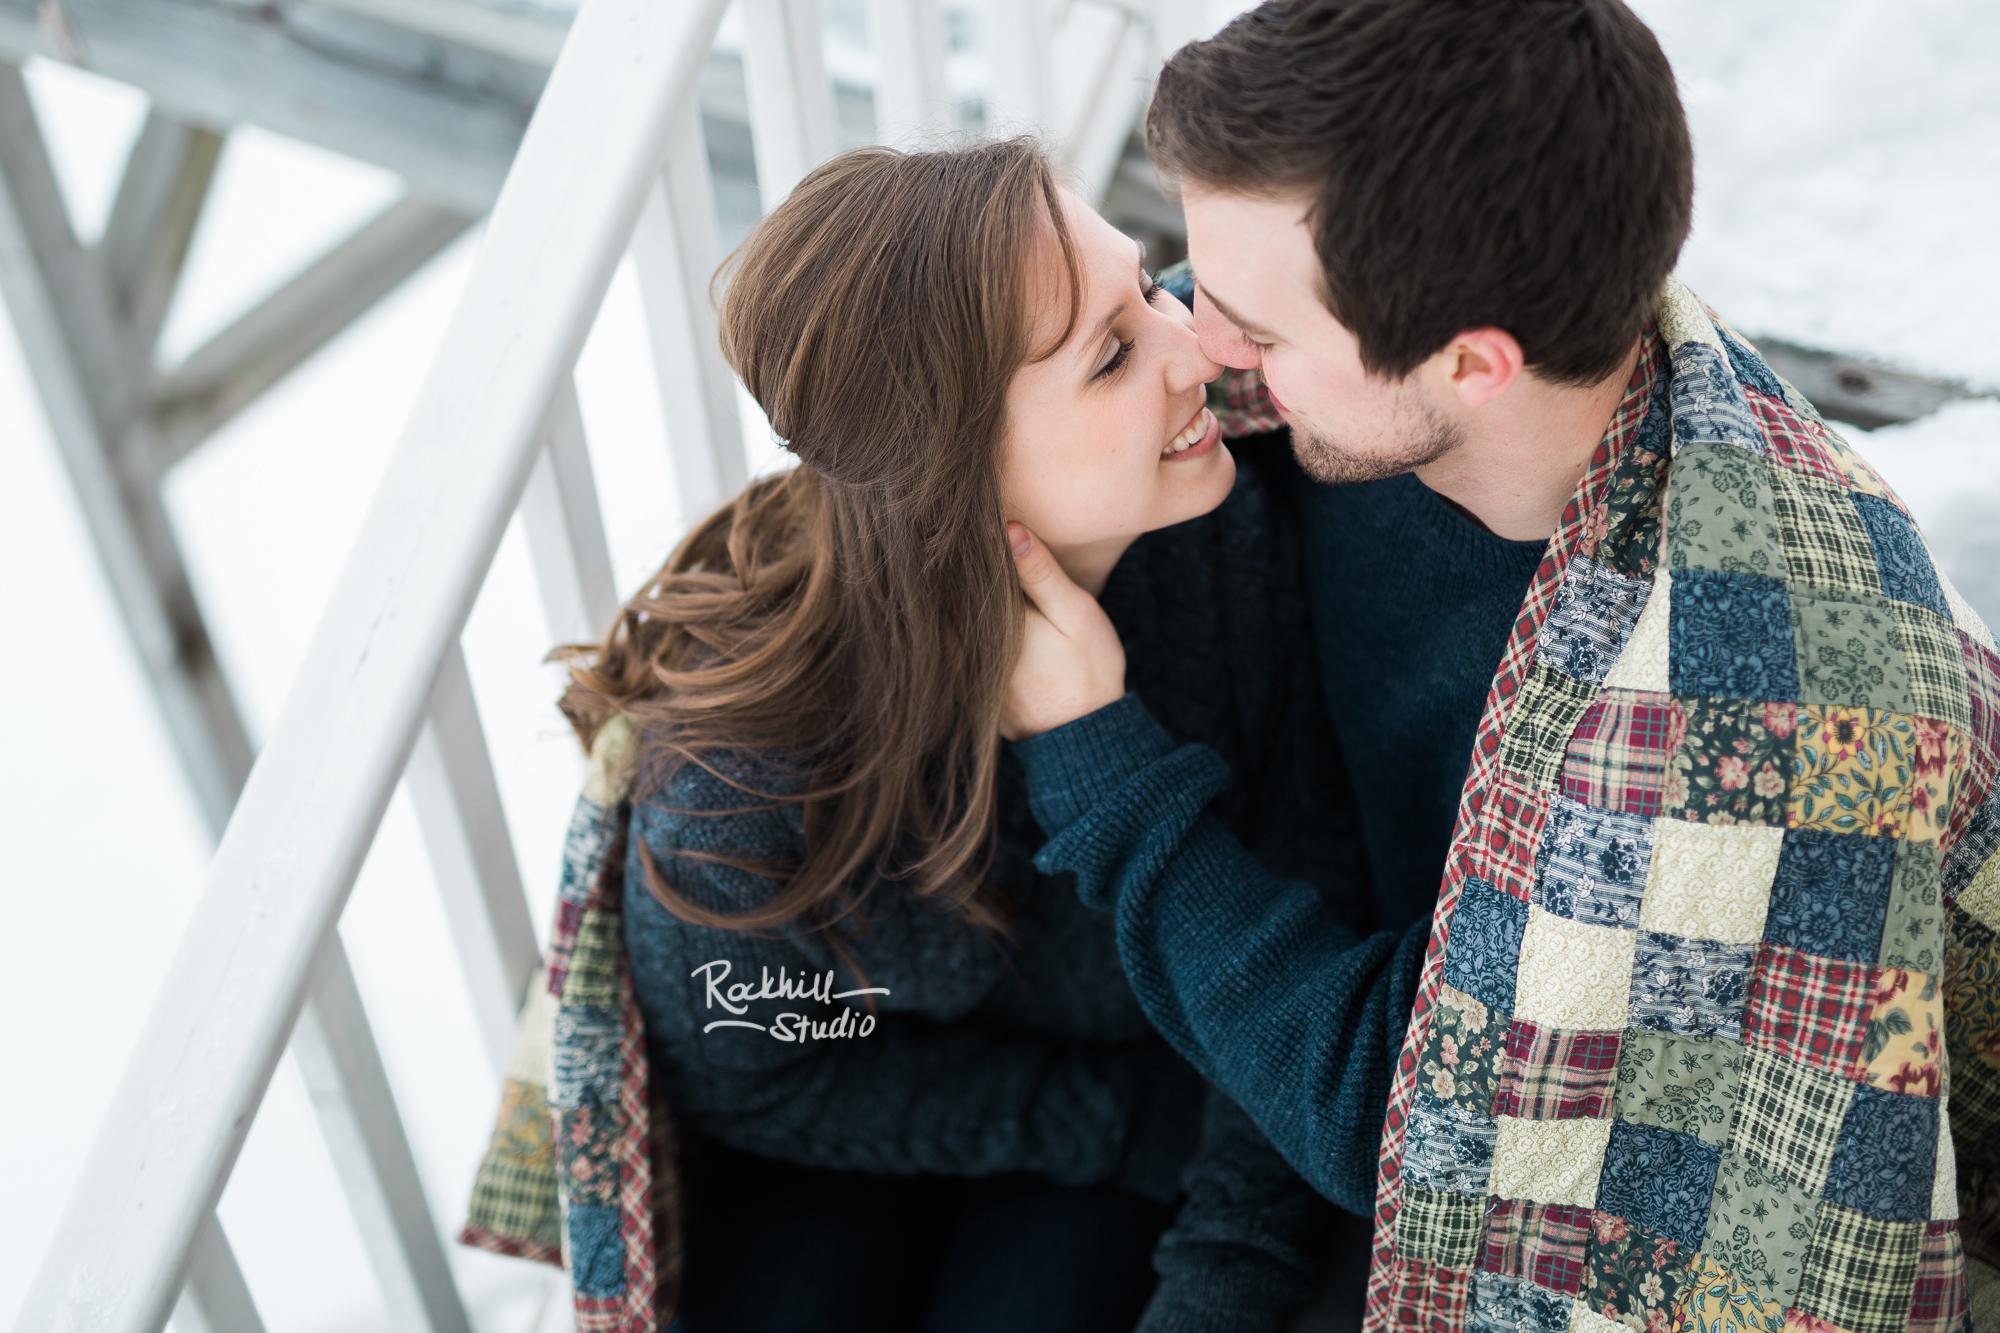 northern-michigan-upper-peninsula-engagement-photography-wedding-rockhill-studio-marquette-16.jpg